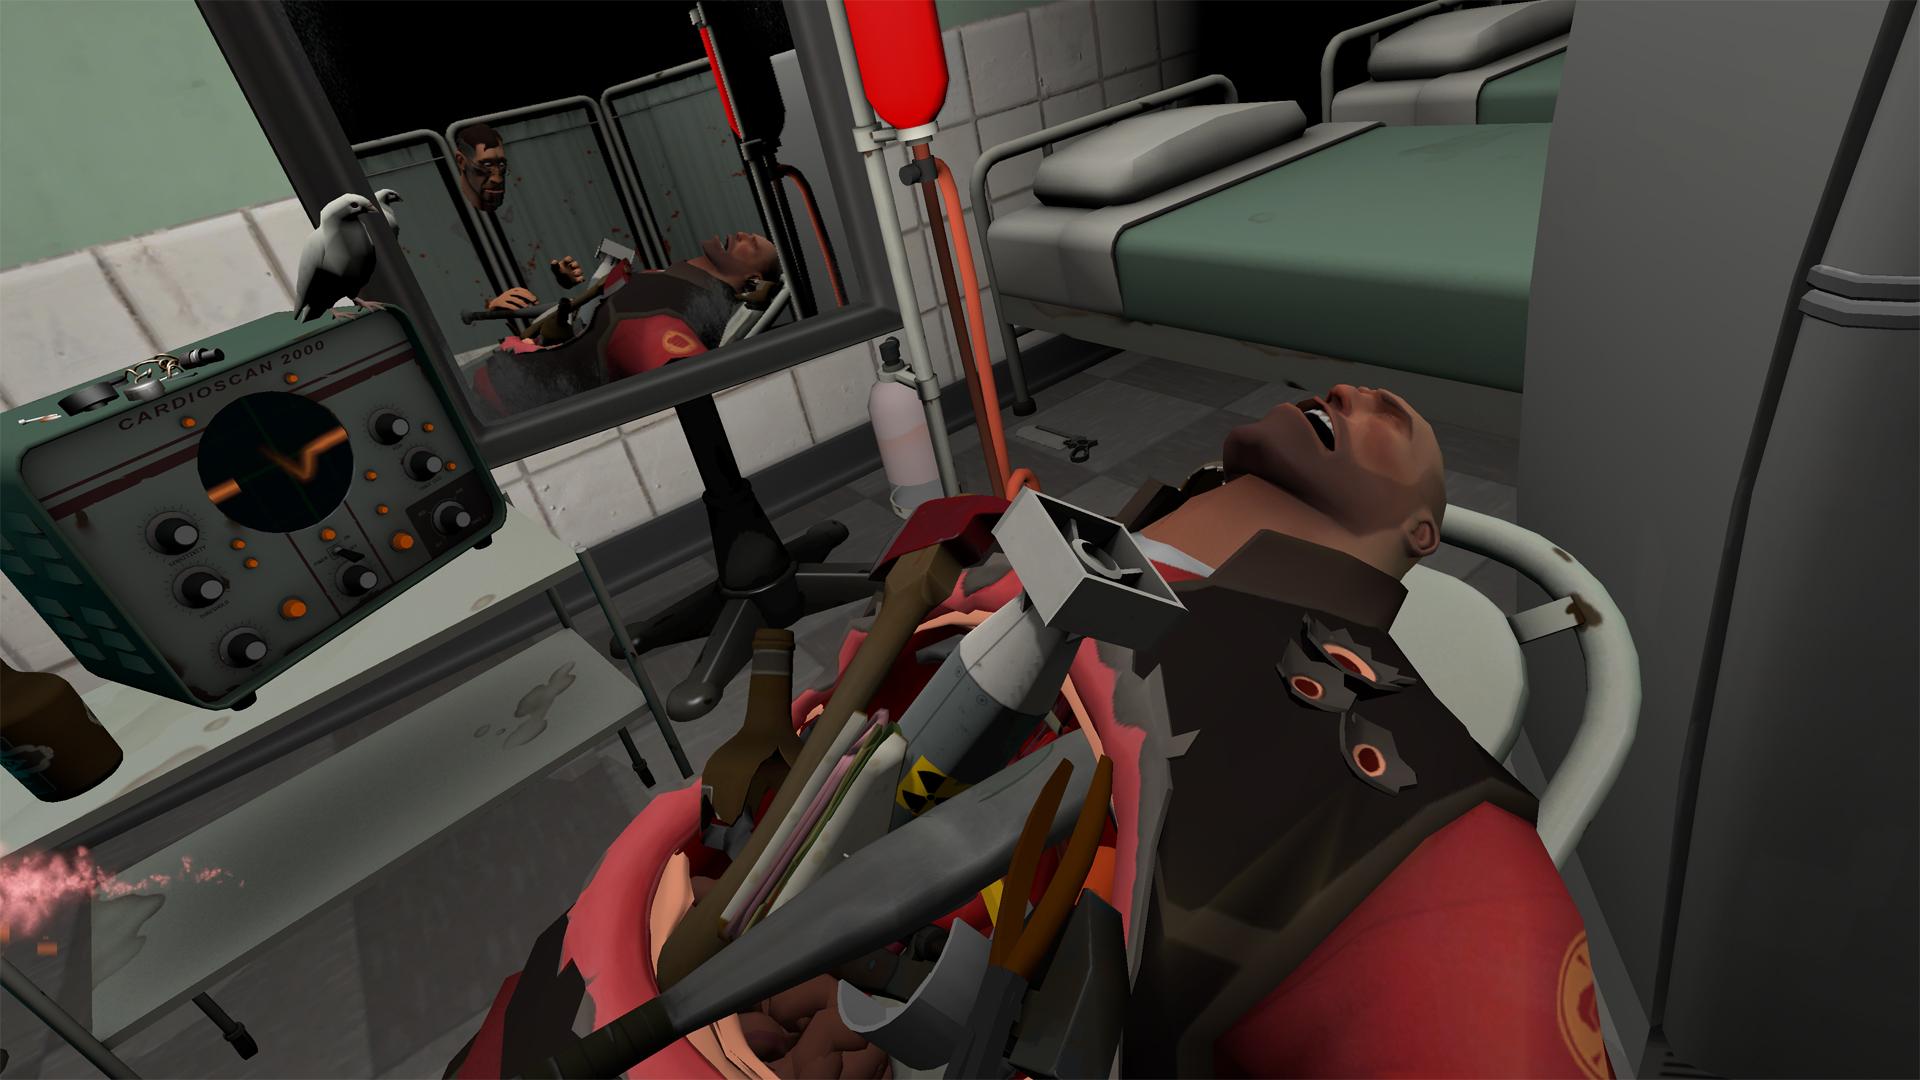 surgeon simulator vr meet the medic on steam